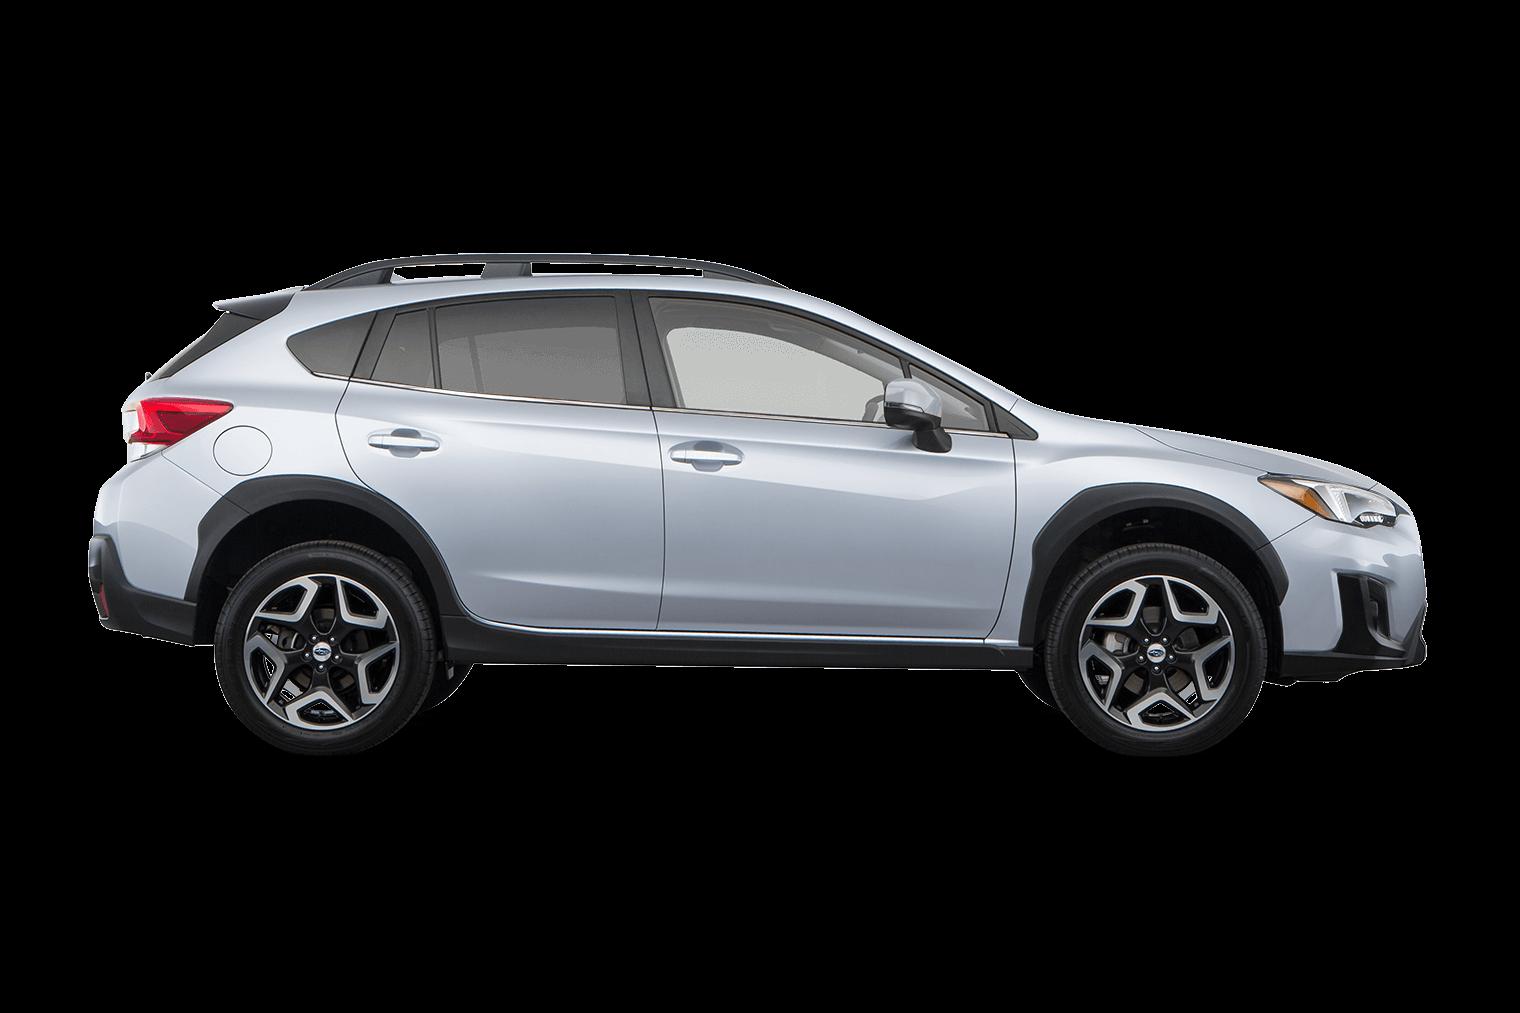 Subaru Build And Price >> Subaru Crosstrek Subaru Subaru Building America